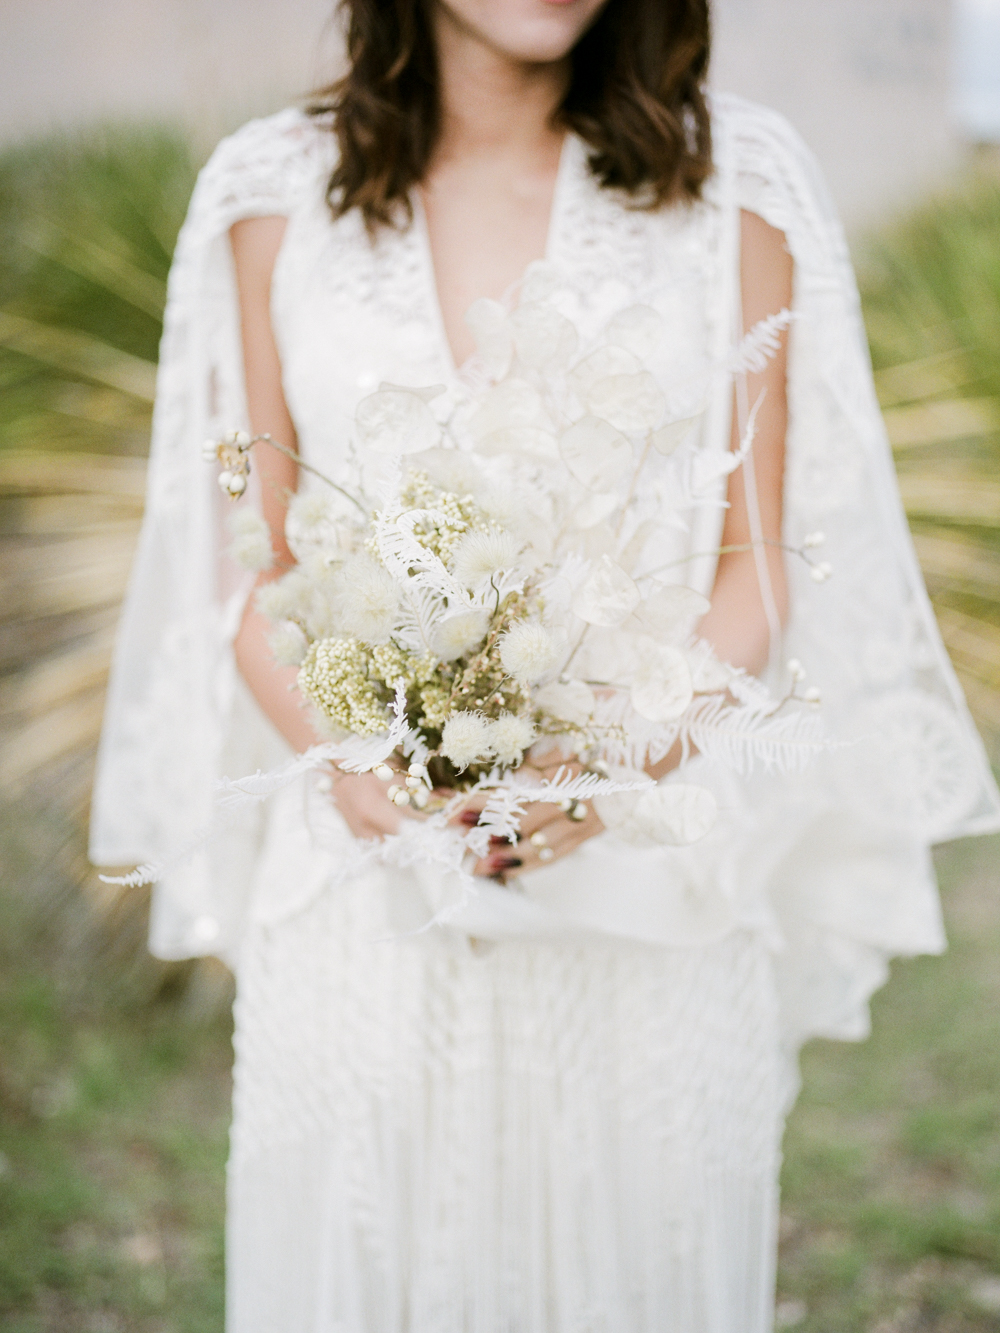 Marfa wedding photographer- destination wedding photographer-christine gosch - film photographer - elopement photographer-7.jpg